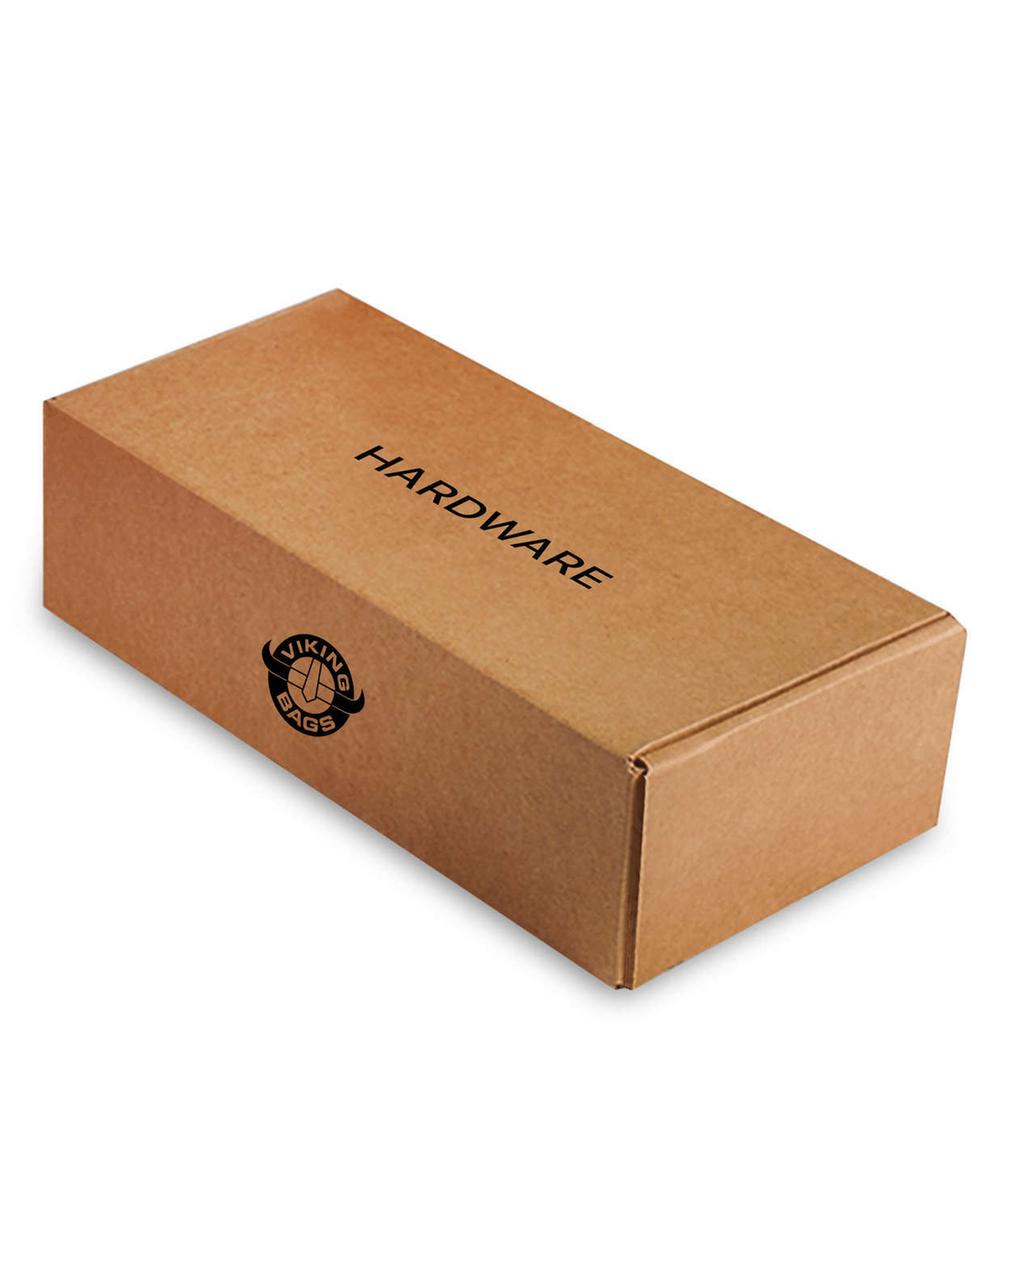 Honda 1500 Valkyrie Standard SS Side Pocket Studded Motorcycle saddlebags Box